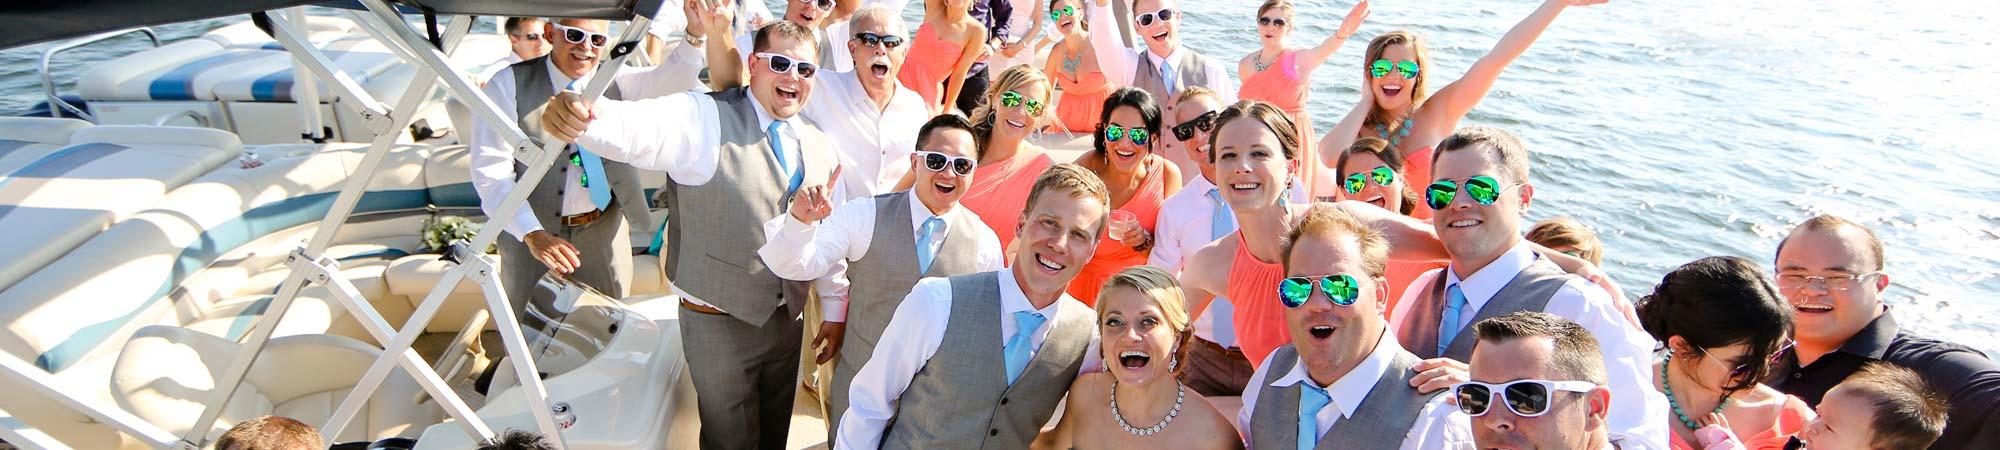 68-2817_Wedding_2000x450_Sliders_C4